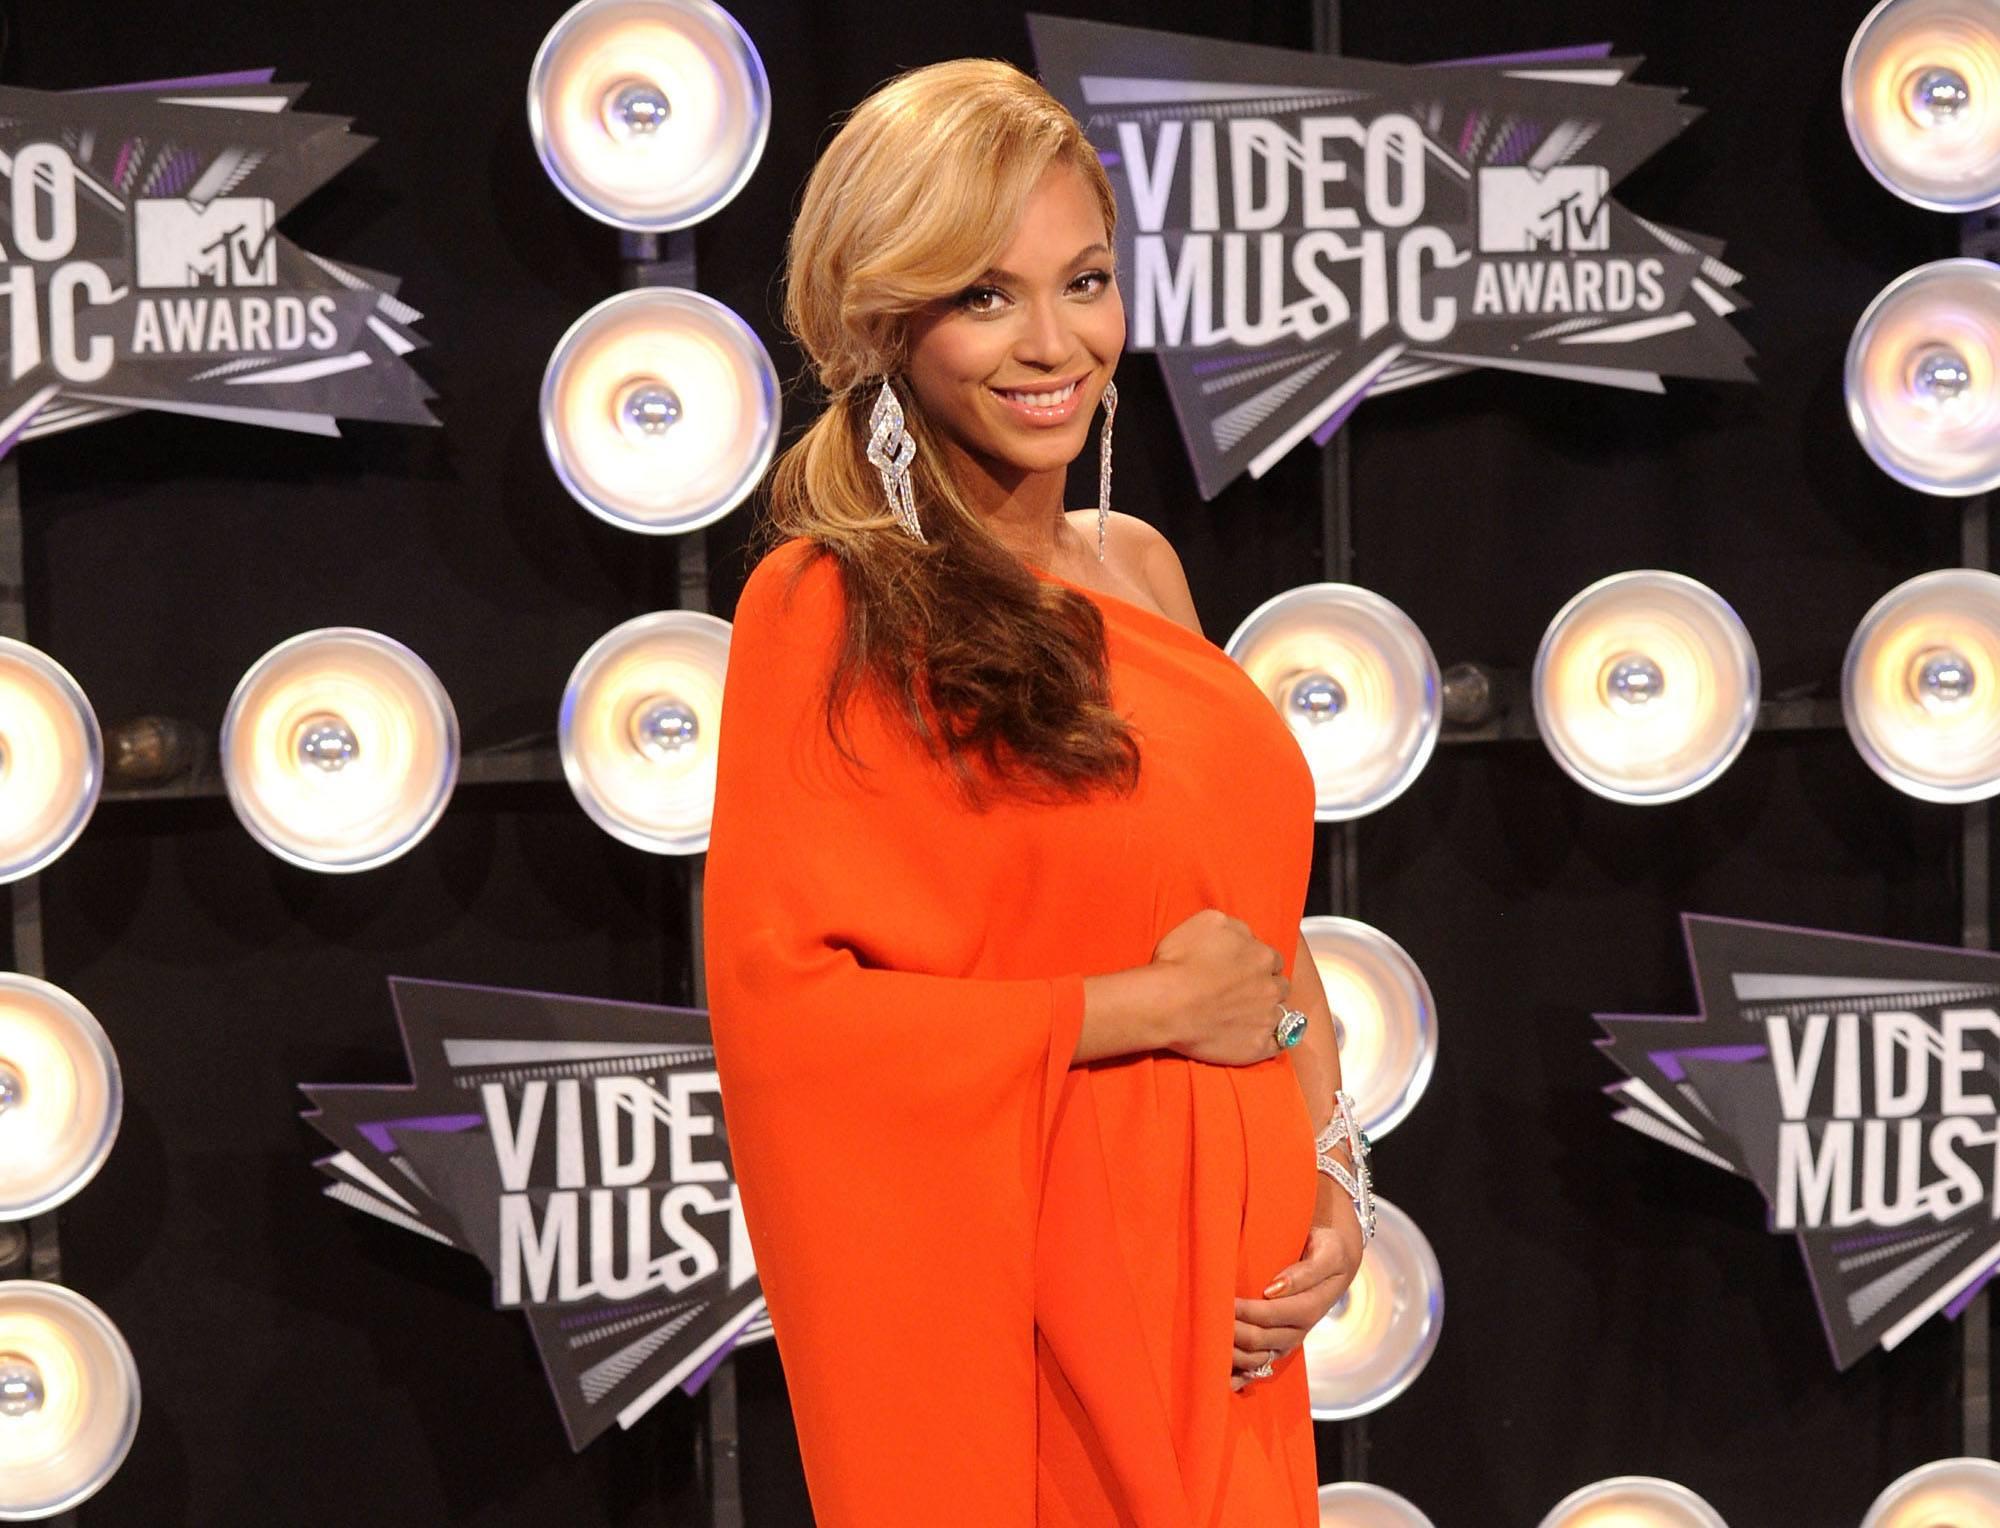 Beyoncé arrives at the 2011 MTV Music Video Awards wearing an orange asymmetrical gown.